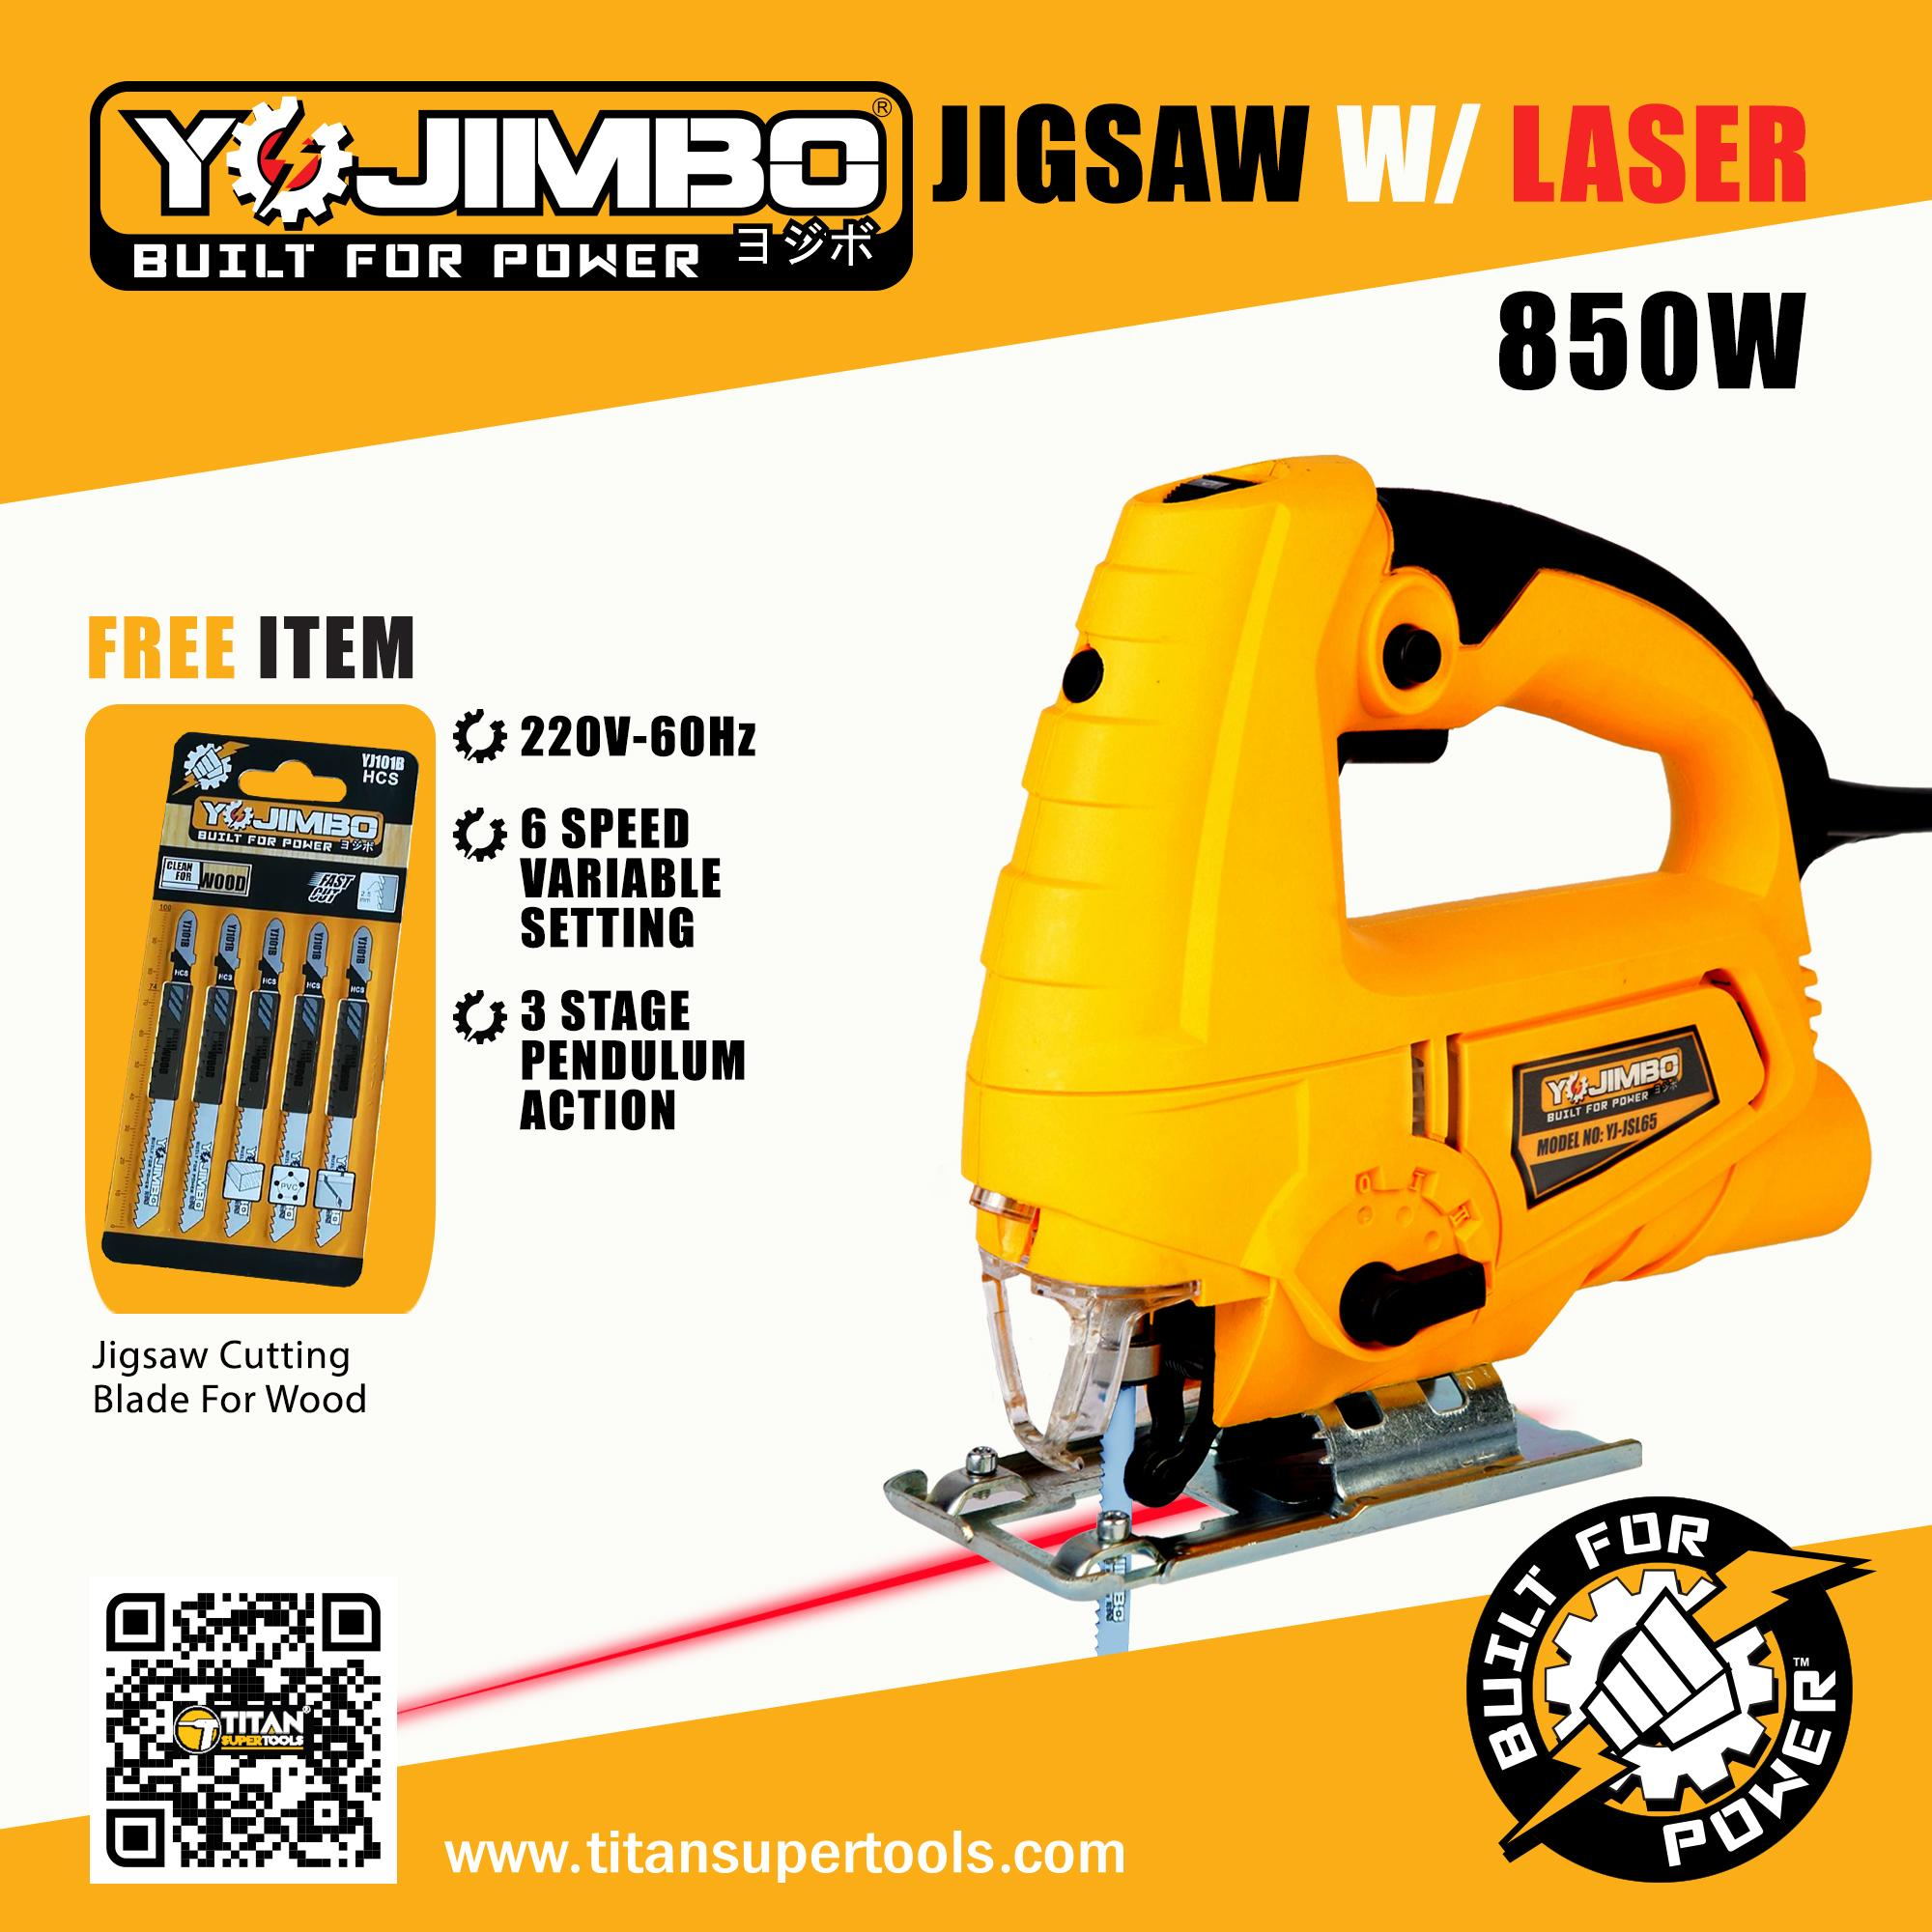 Yojimbo 850W Electric Jigsaw with Laser